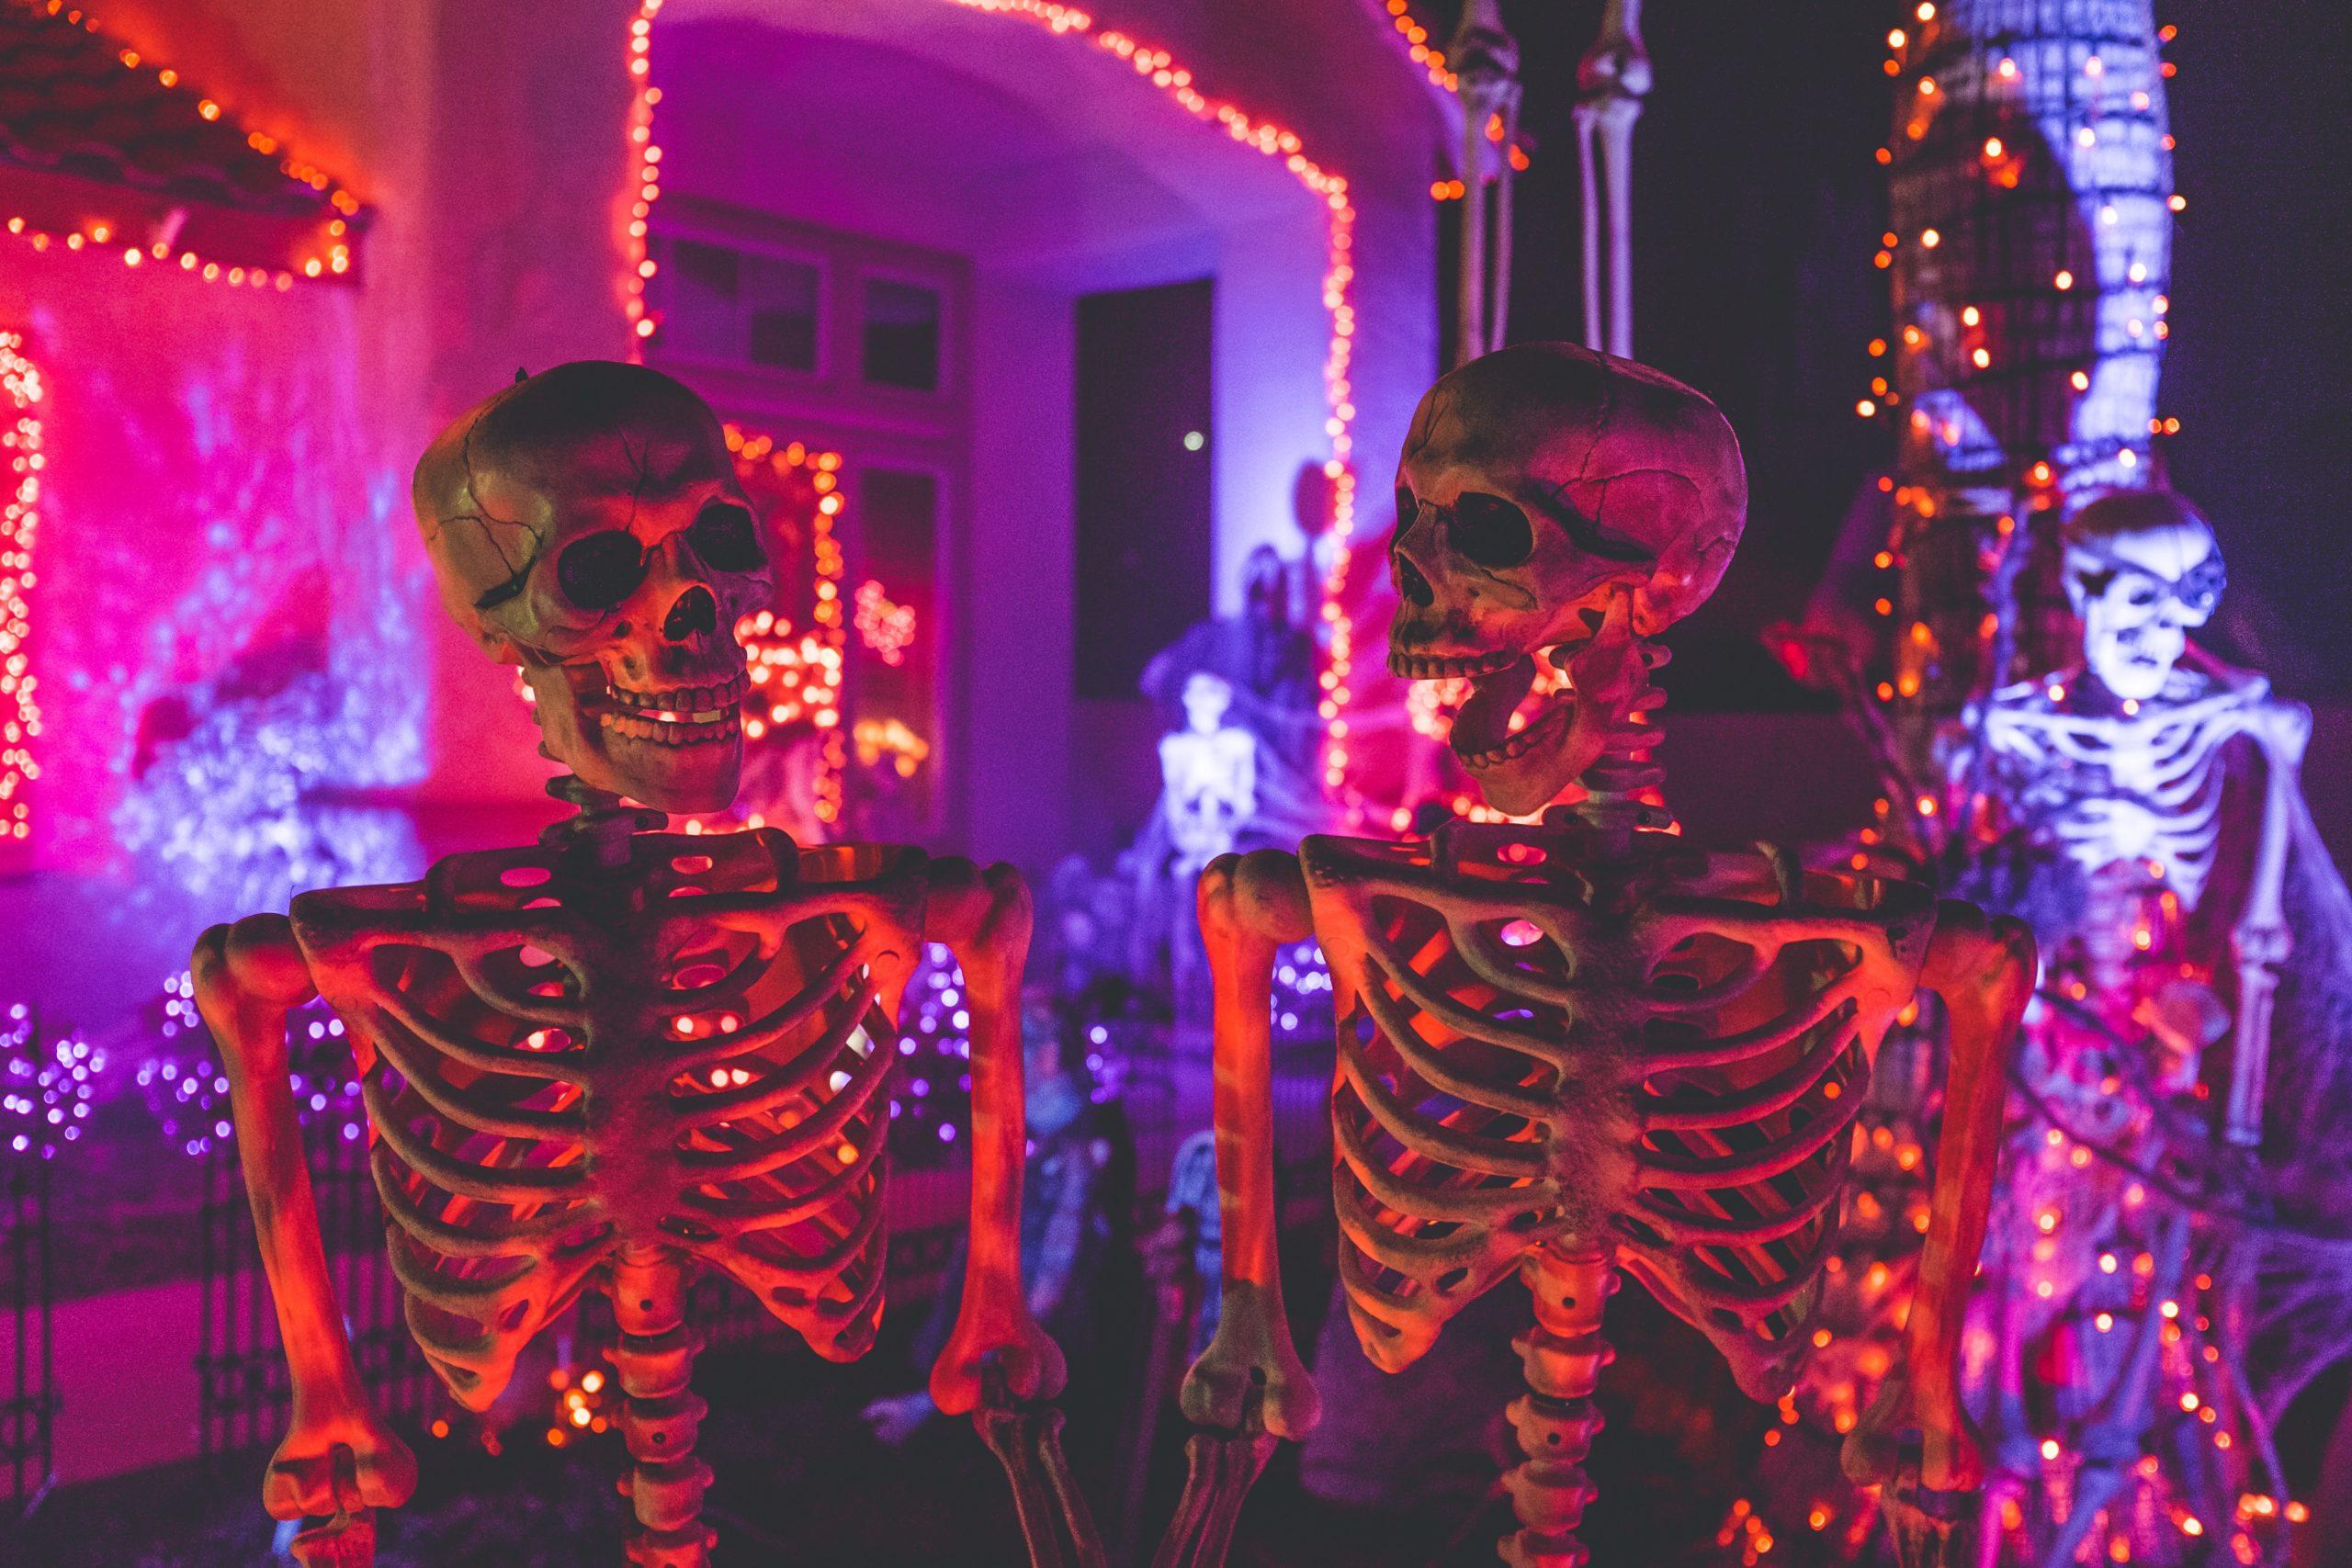 Halloween Party Nightmares To Avoid